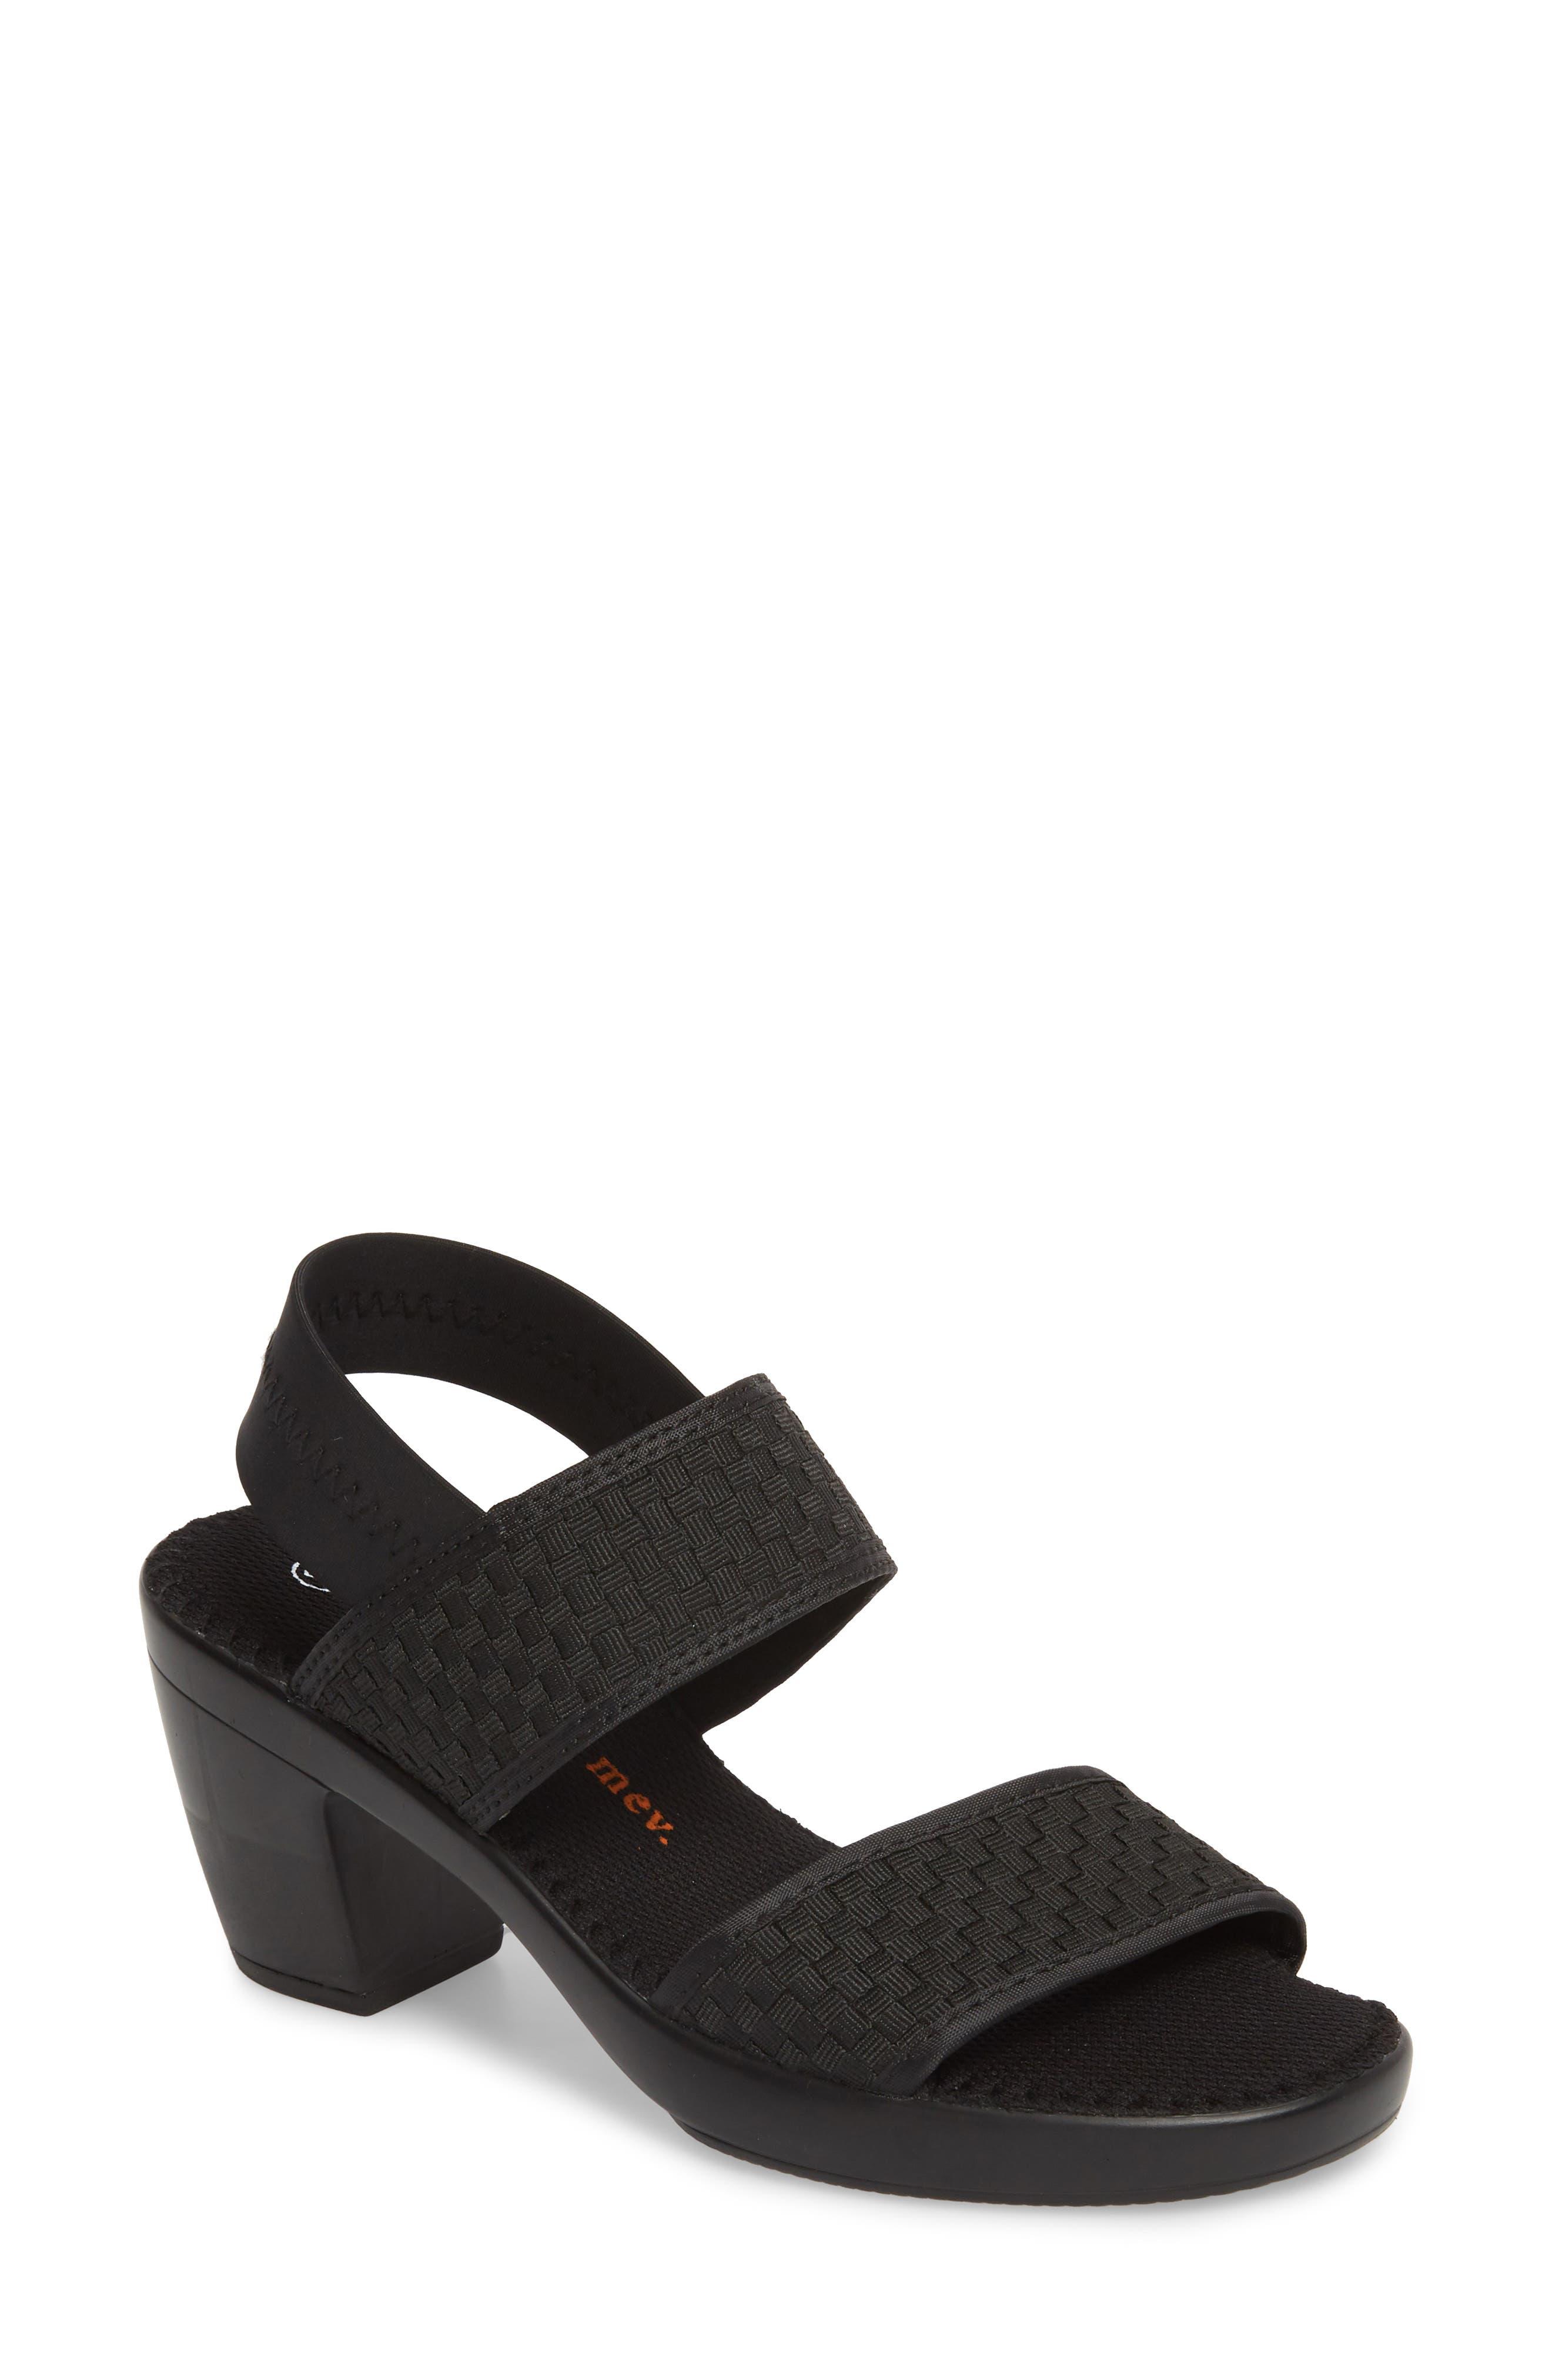 Santorini Sandal,                         Main,                         color, BLACK FABRIC